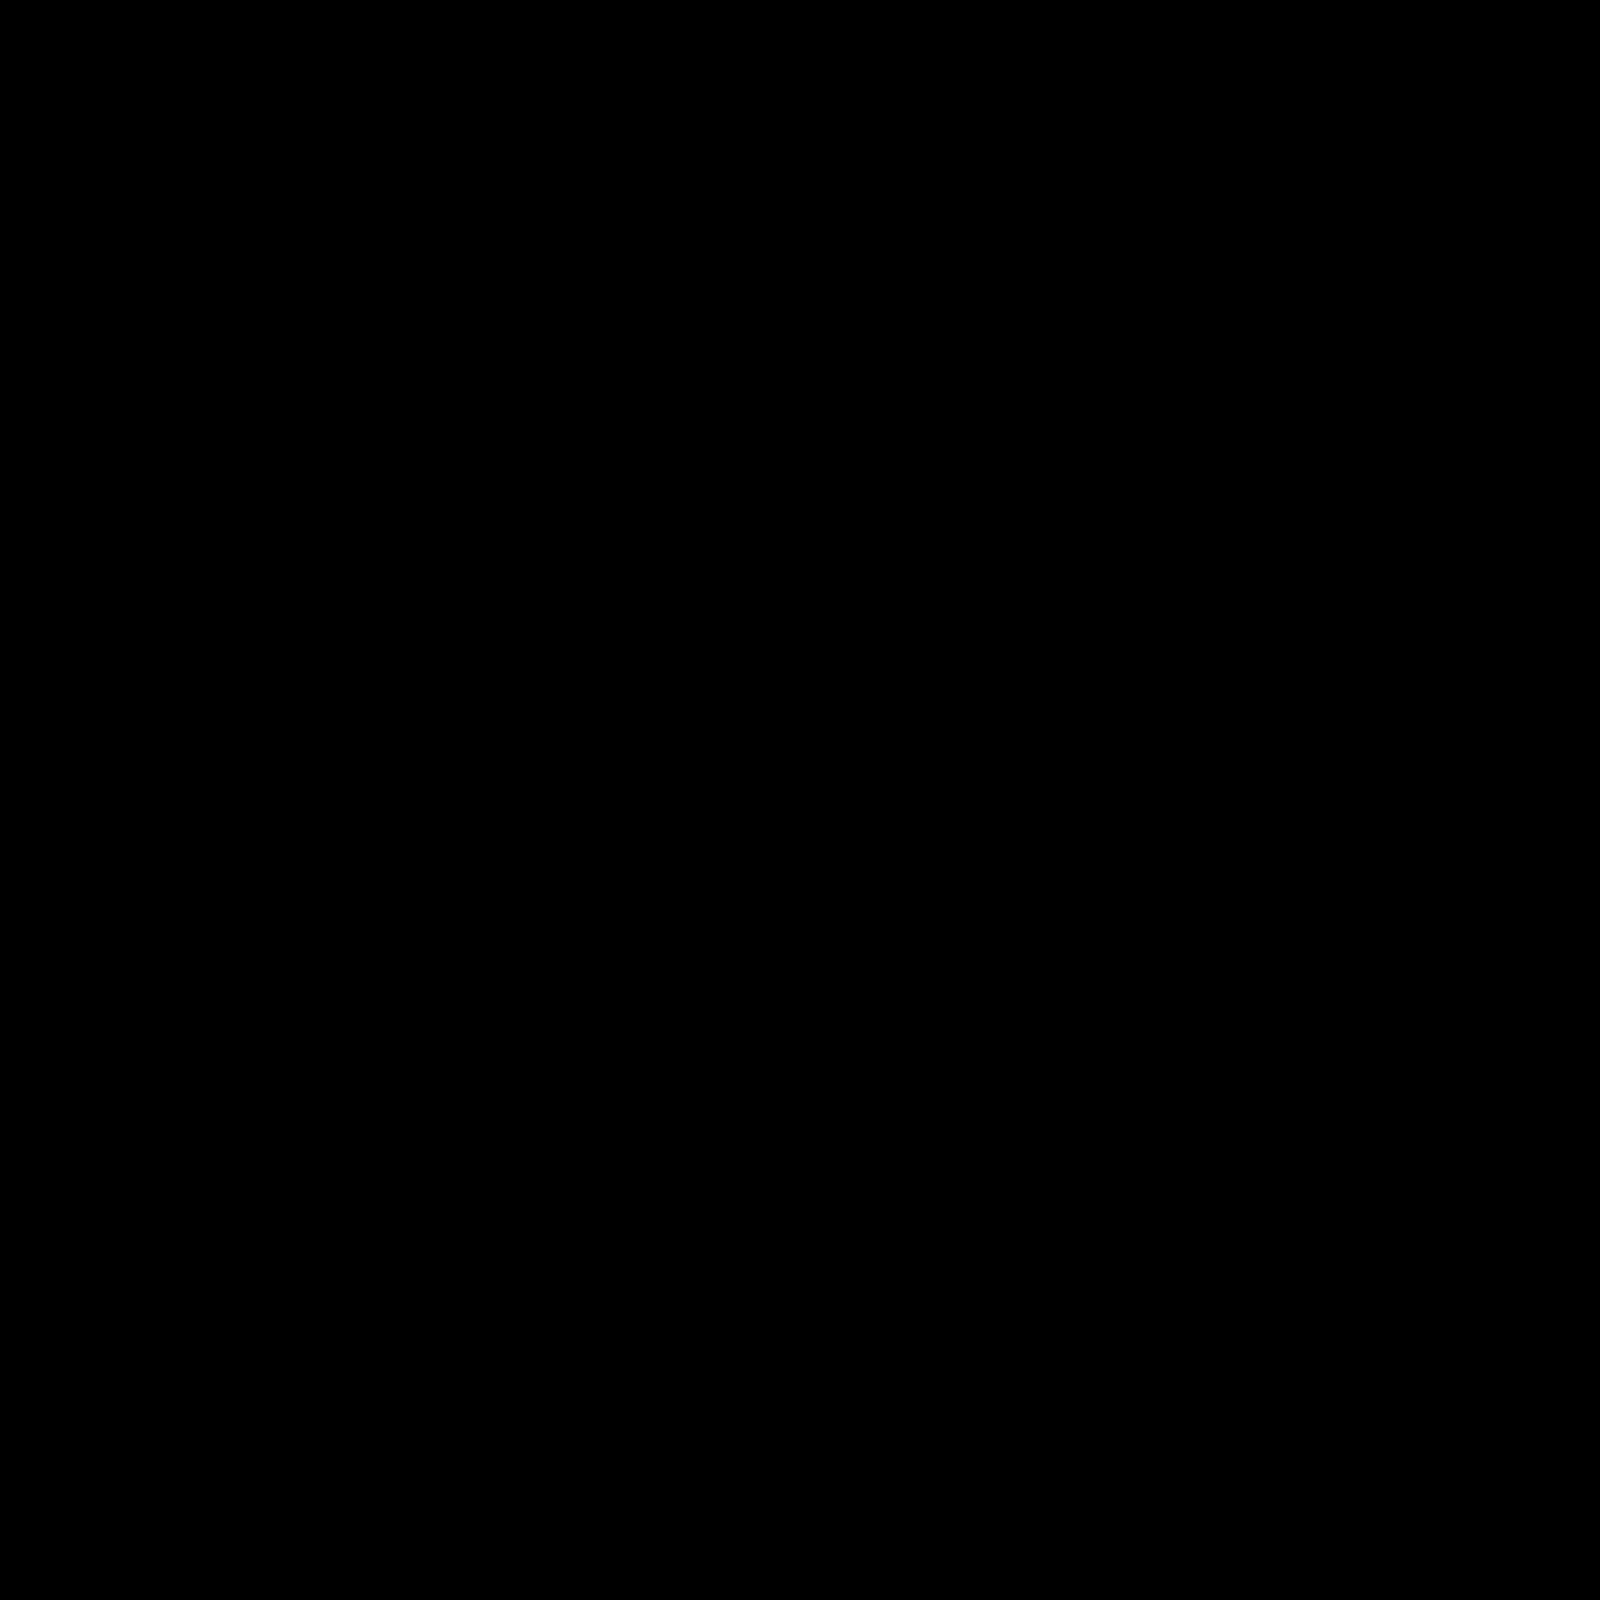 Elipsa obrysowana icon